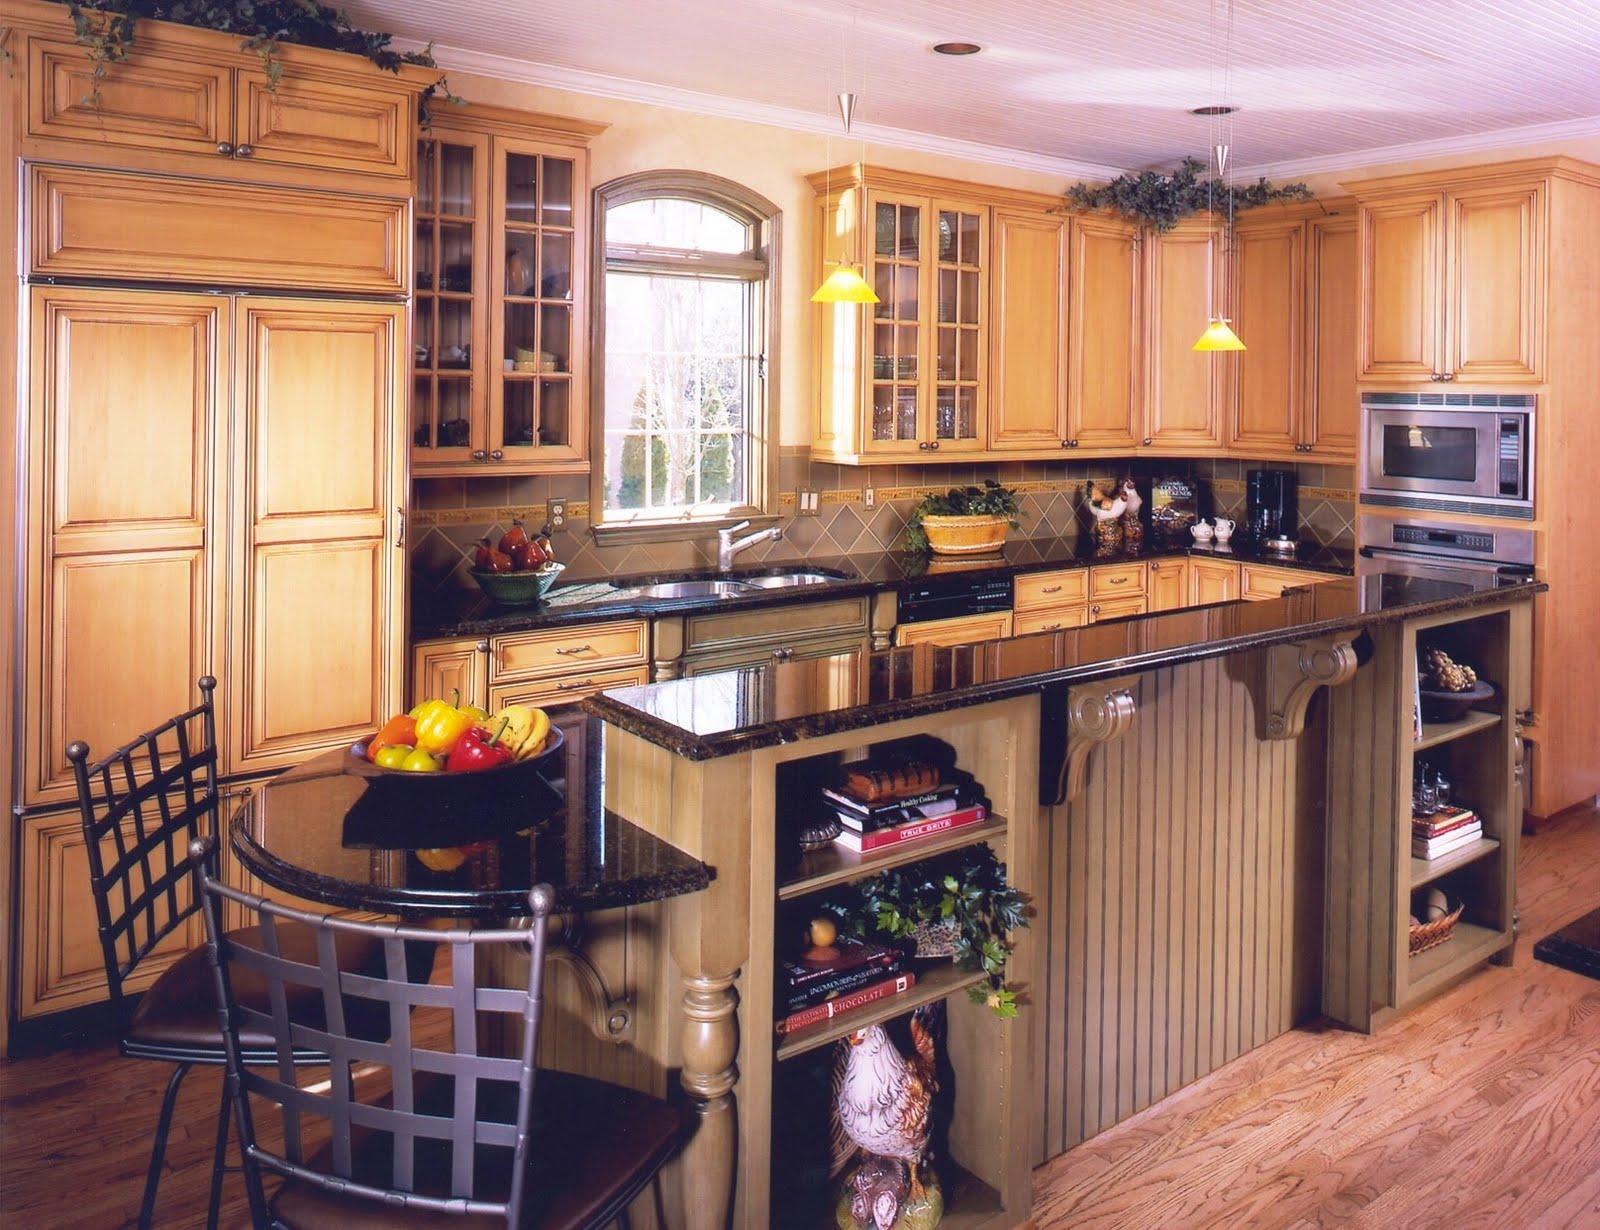 Csi Kitchen Bath News Have It Your Way